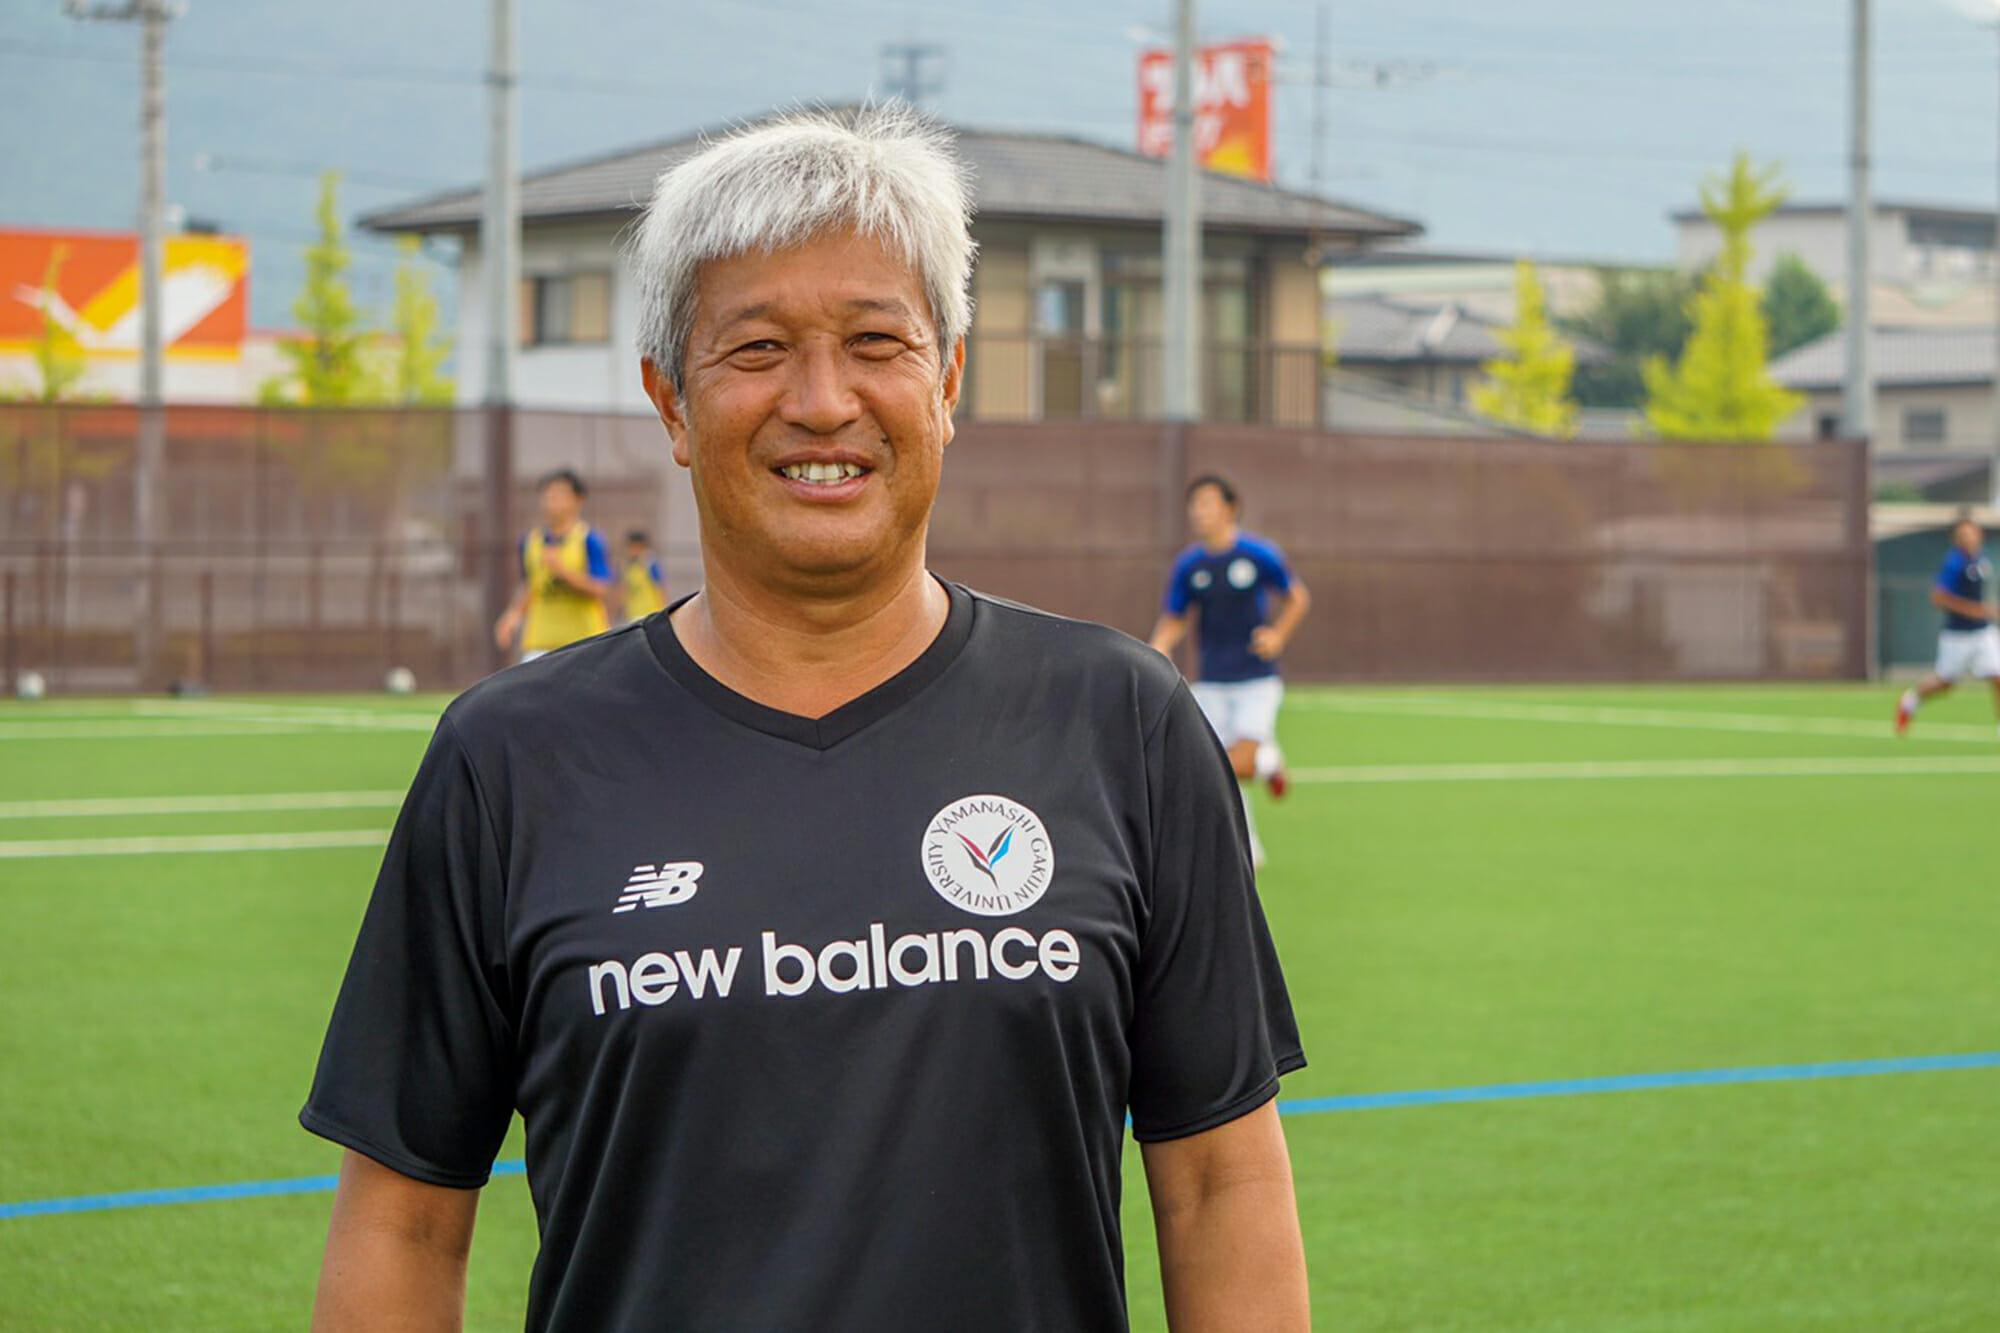 Vol.24 山梨学院大サッカー部 監督/岩渕弘幹